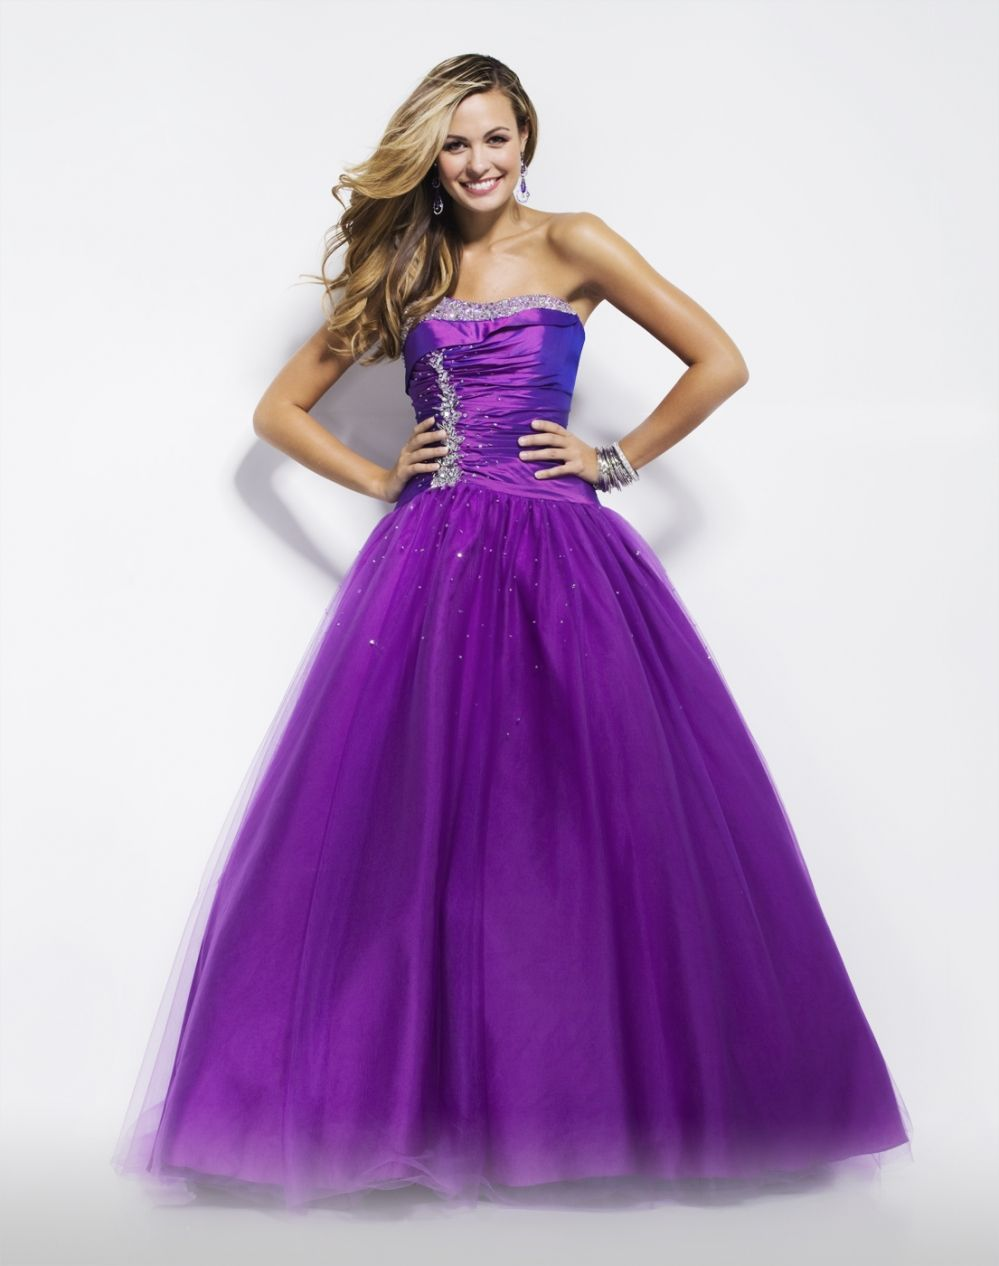 rivadesigns #promdress #internationalprom #purplepromdress | Prom ...